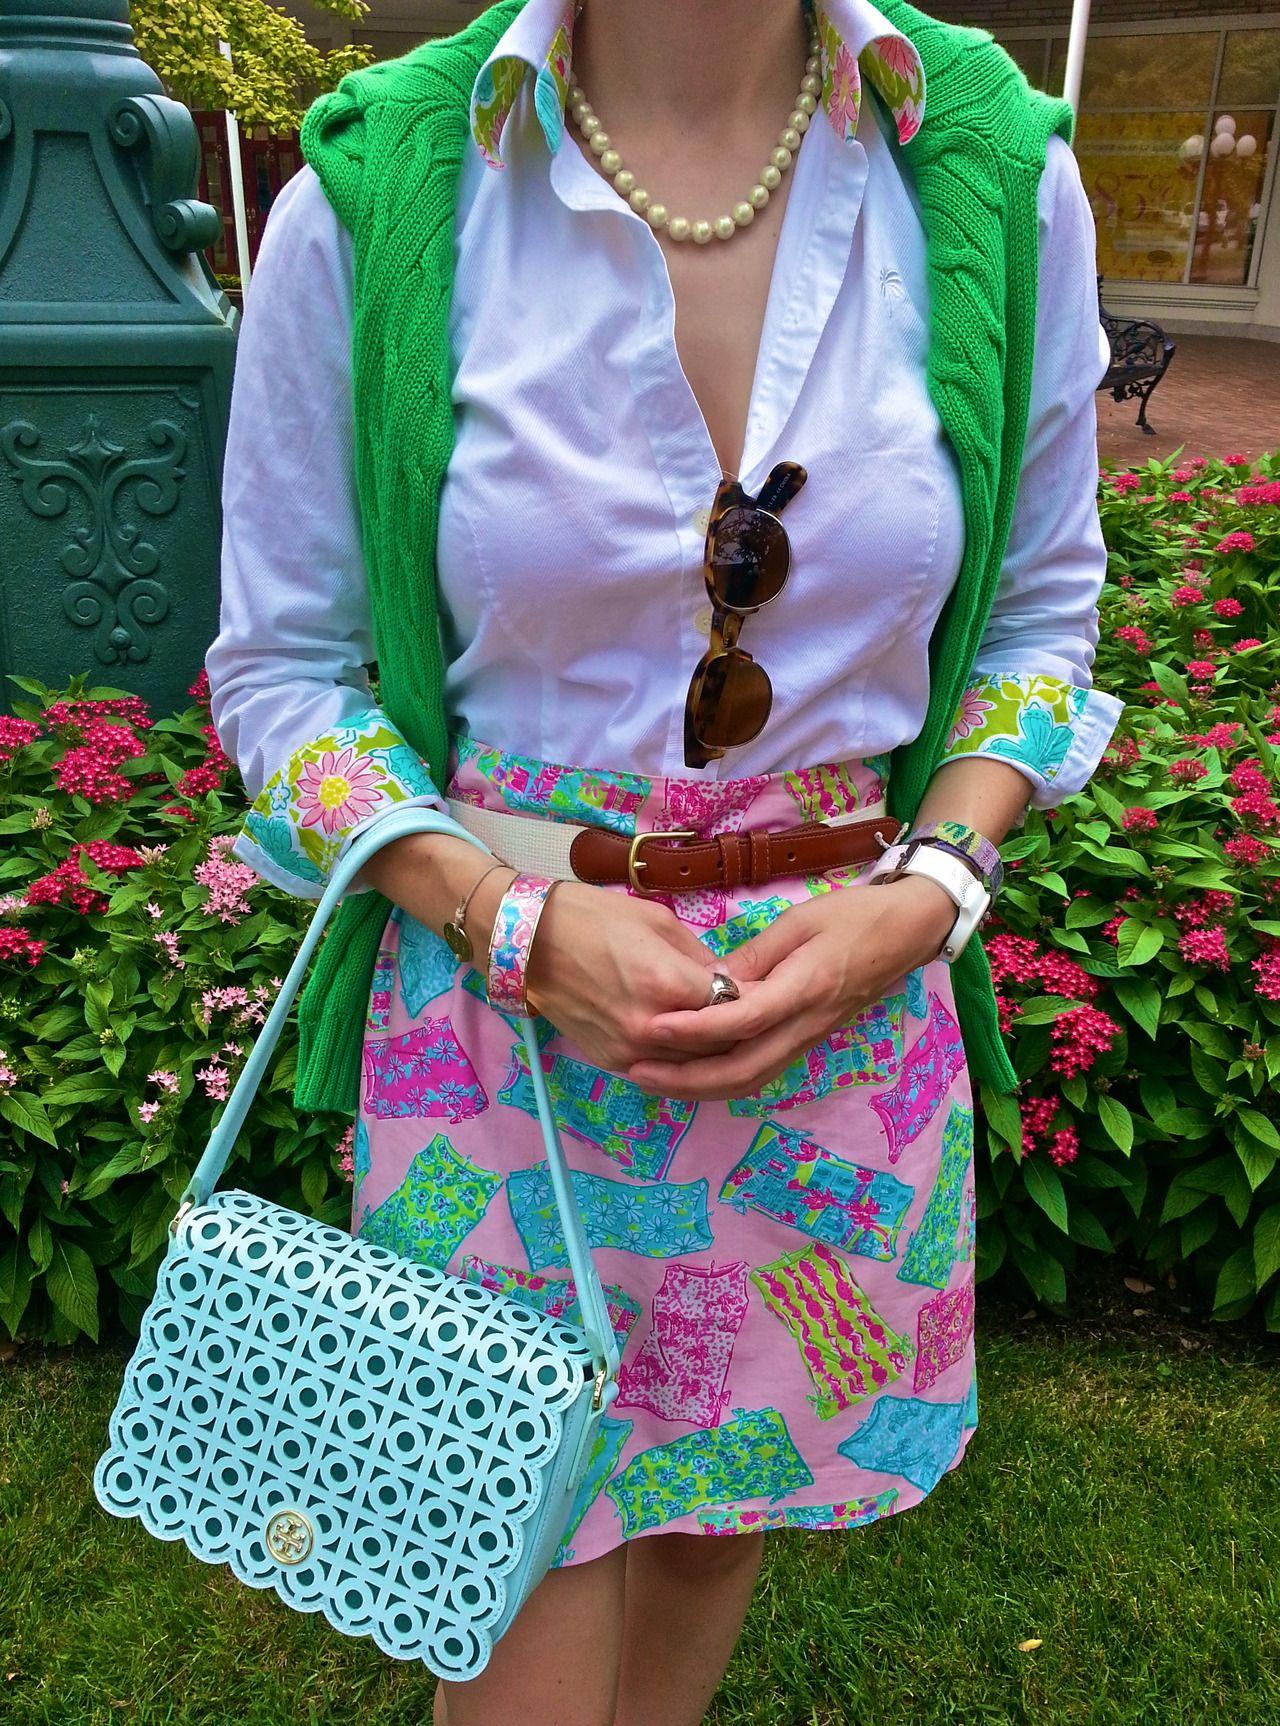 I want this skirt!  semperpreparatus:  OOTD: Labor Day Lilly. Shirt: Lilly Pulitzer Skirt: Lilly Pulitzer Sweater: Ralph Lauren Belt: Coach Purse: Tory Burch Pe...